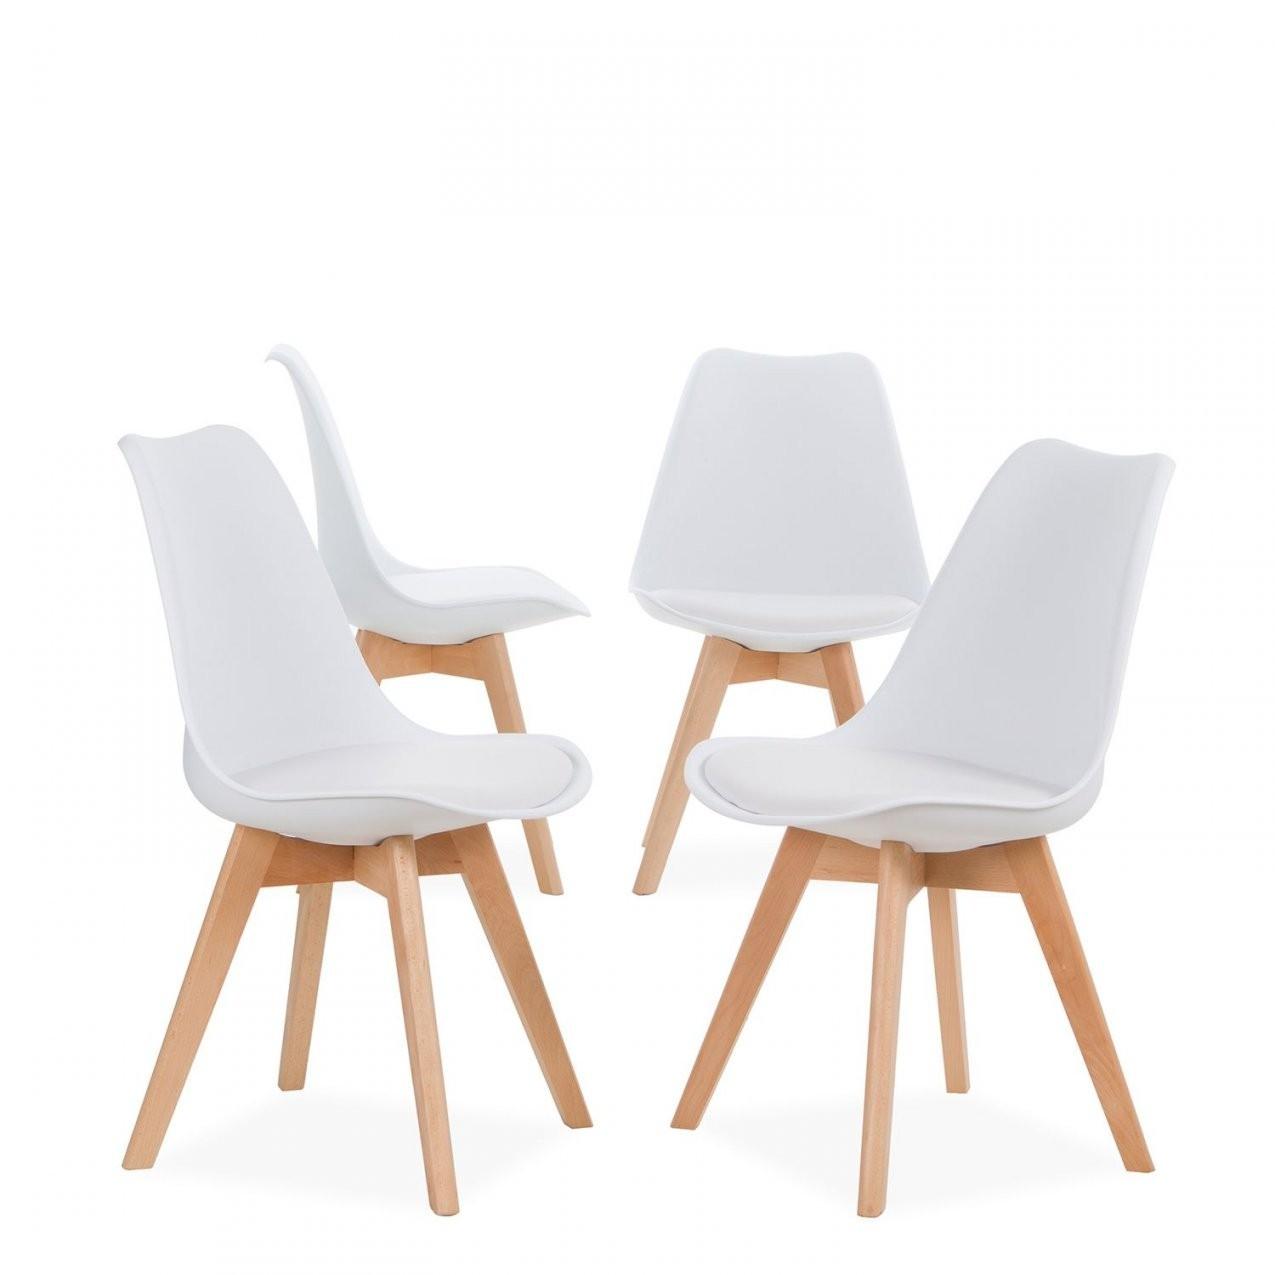 4 Skandinavische Stühle Tulipa (Packs) von Skandinavische Stühle Klassiker Photo